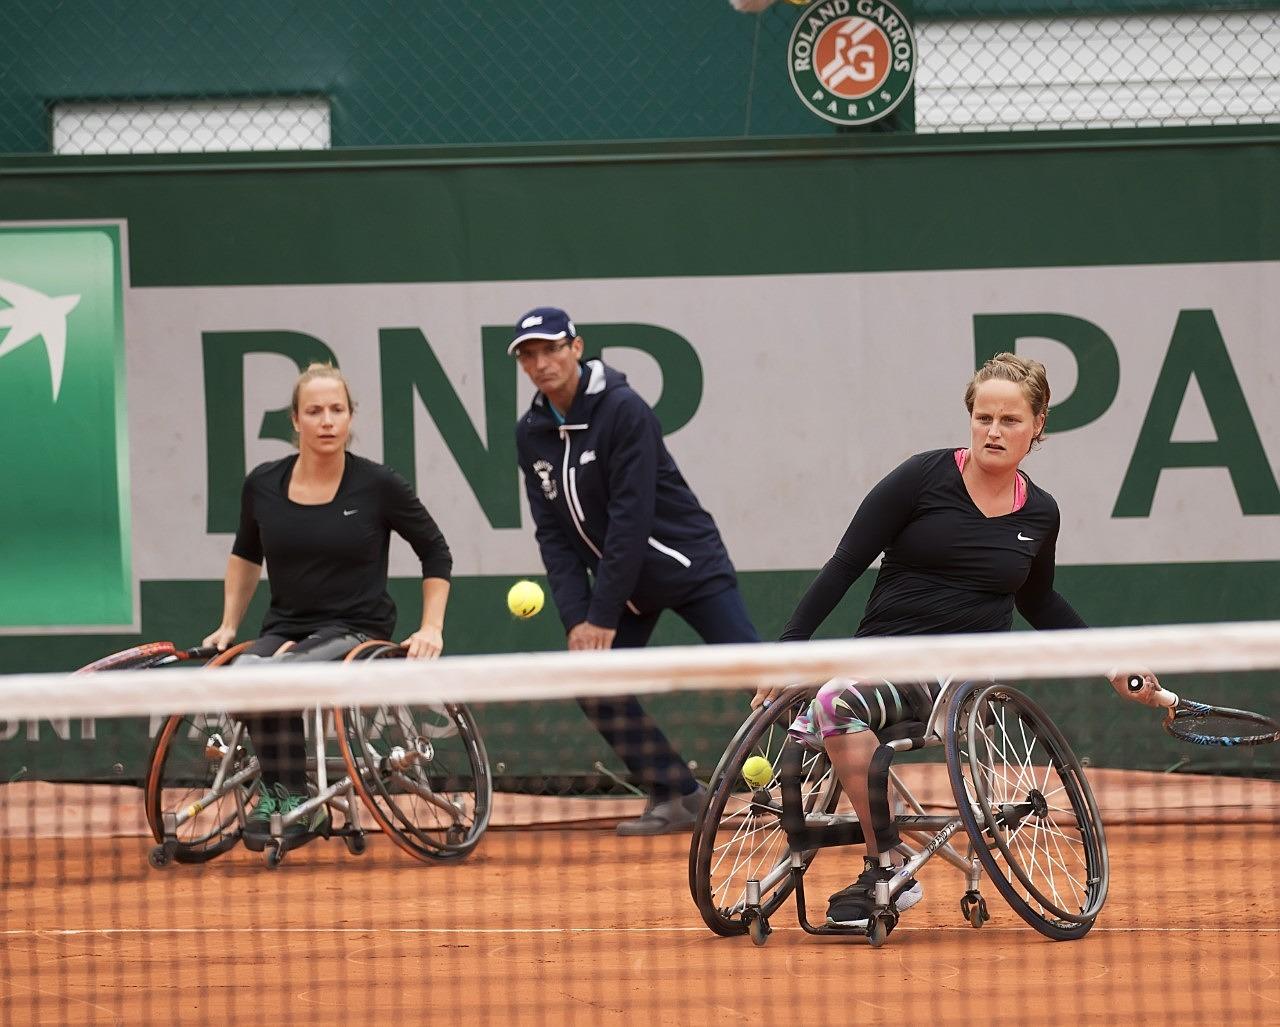 Tennisvereniging rijnhuyse nieuwegein